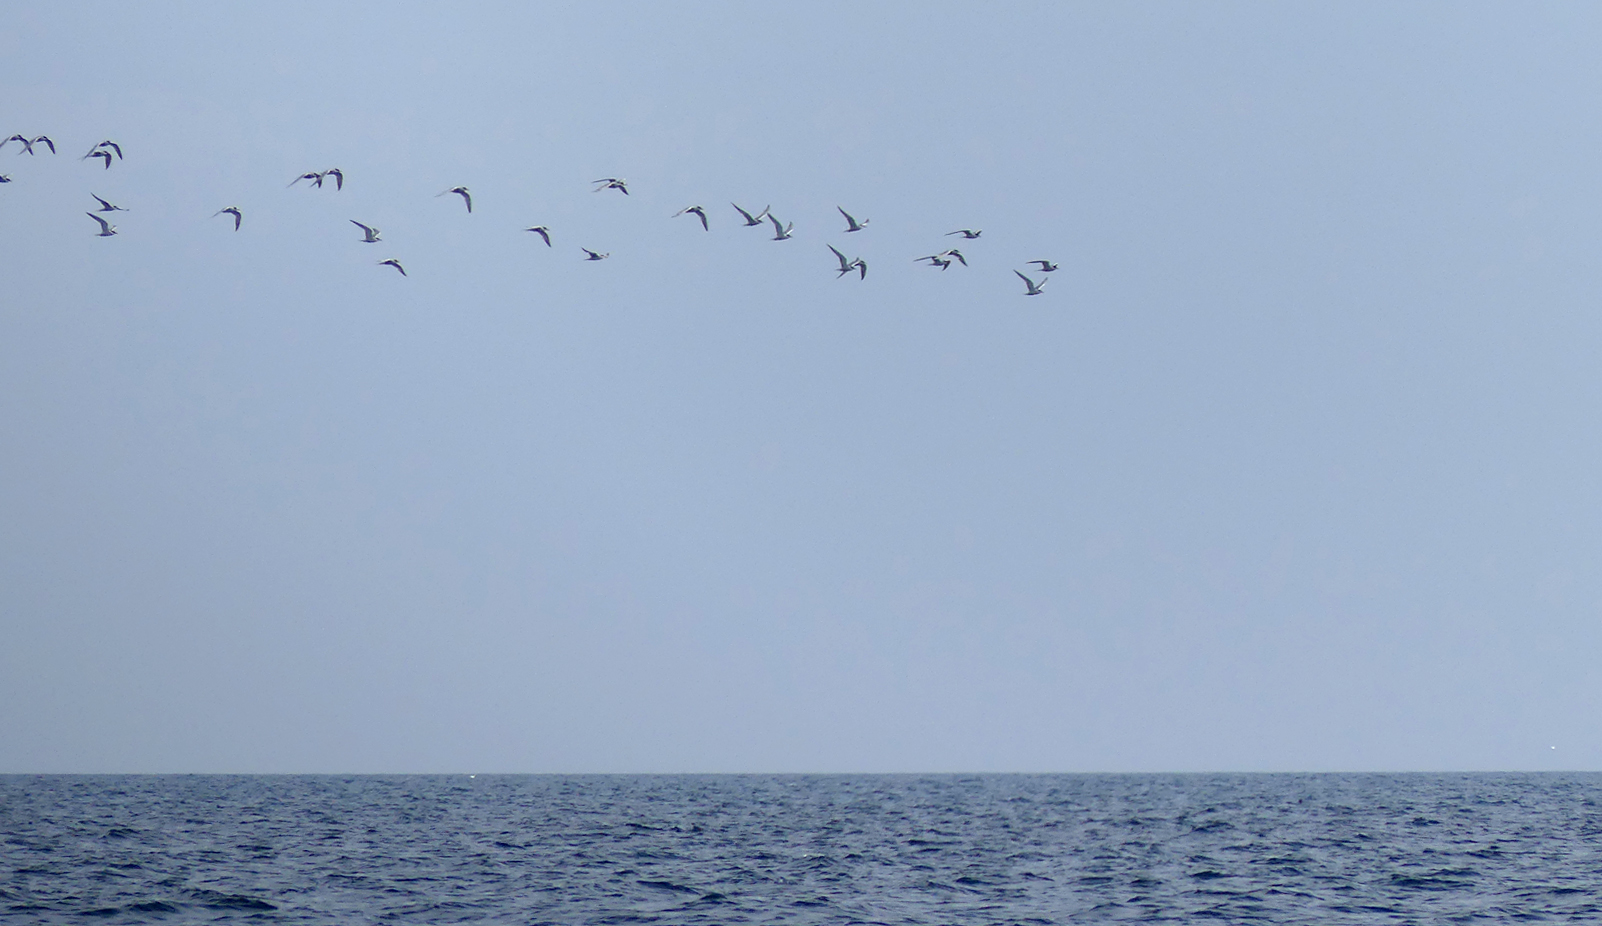 Common Tern - pelagic, 14 Aug 17